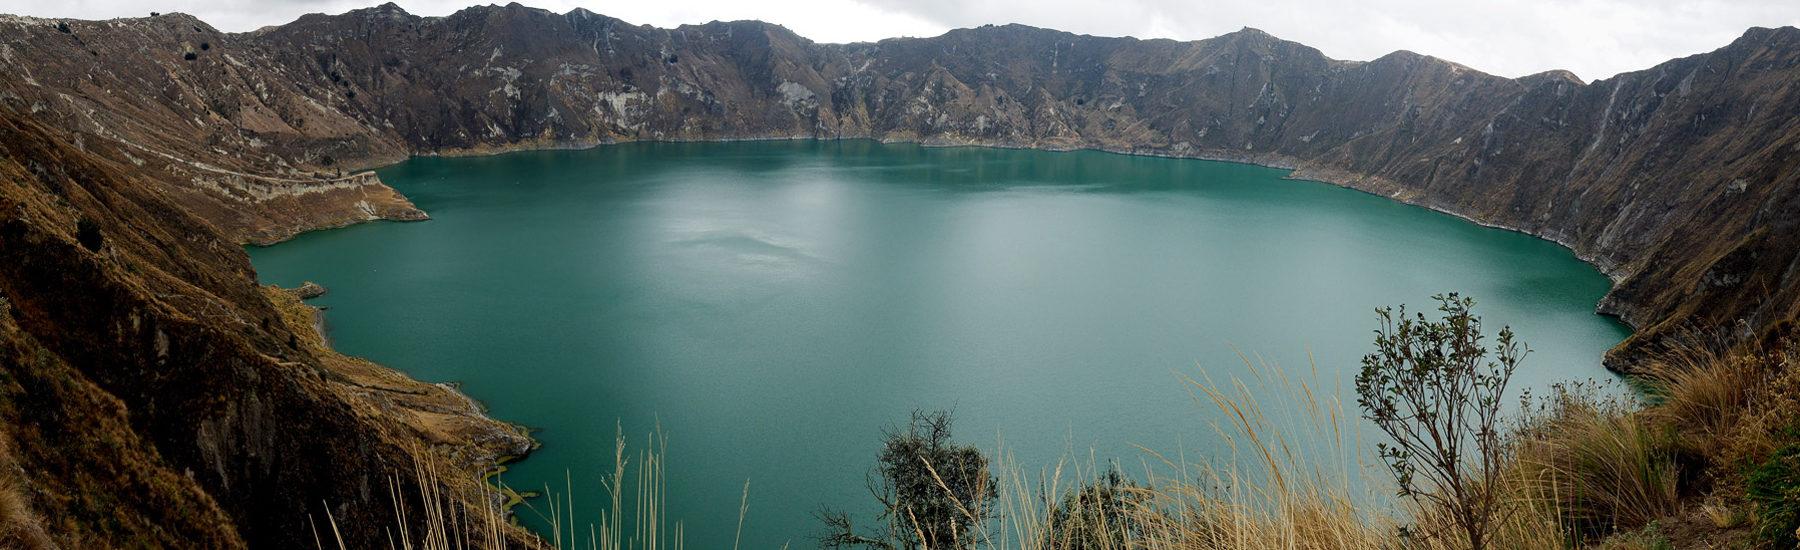 Laguna Quilotoa Panorama